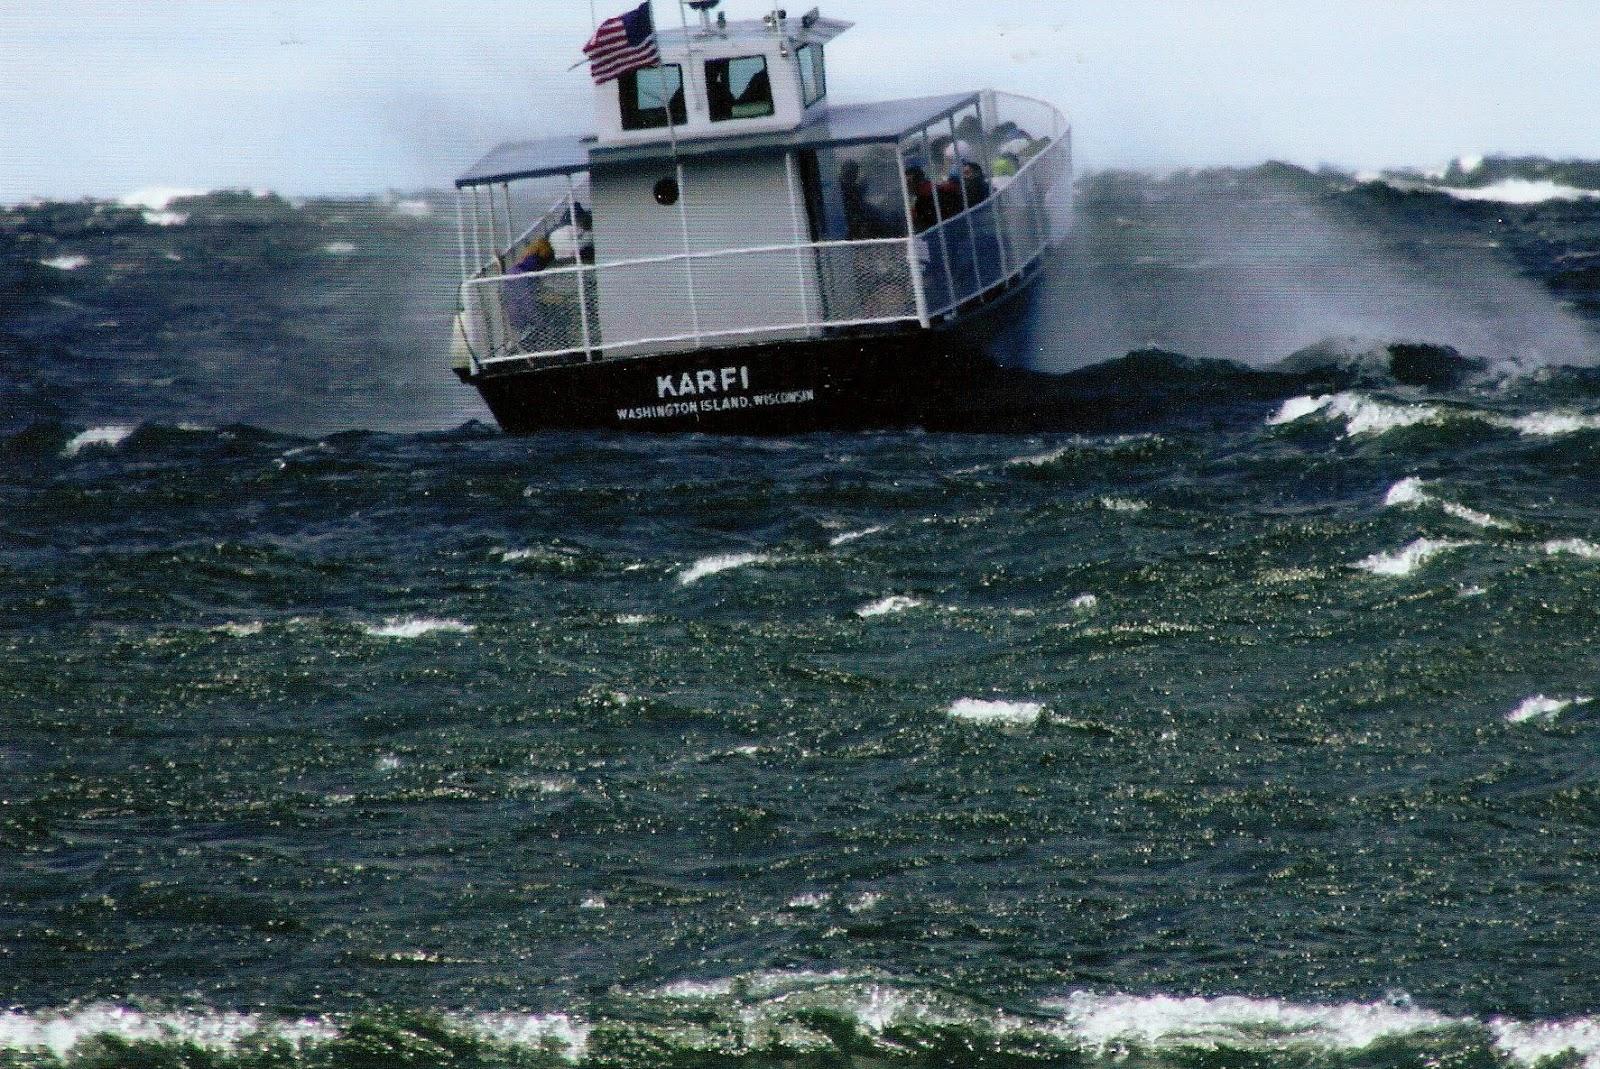 FERRY CABIN NEWS: ROCK ISLAND FERRY